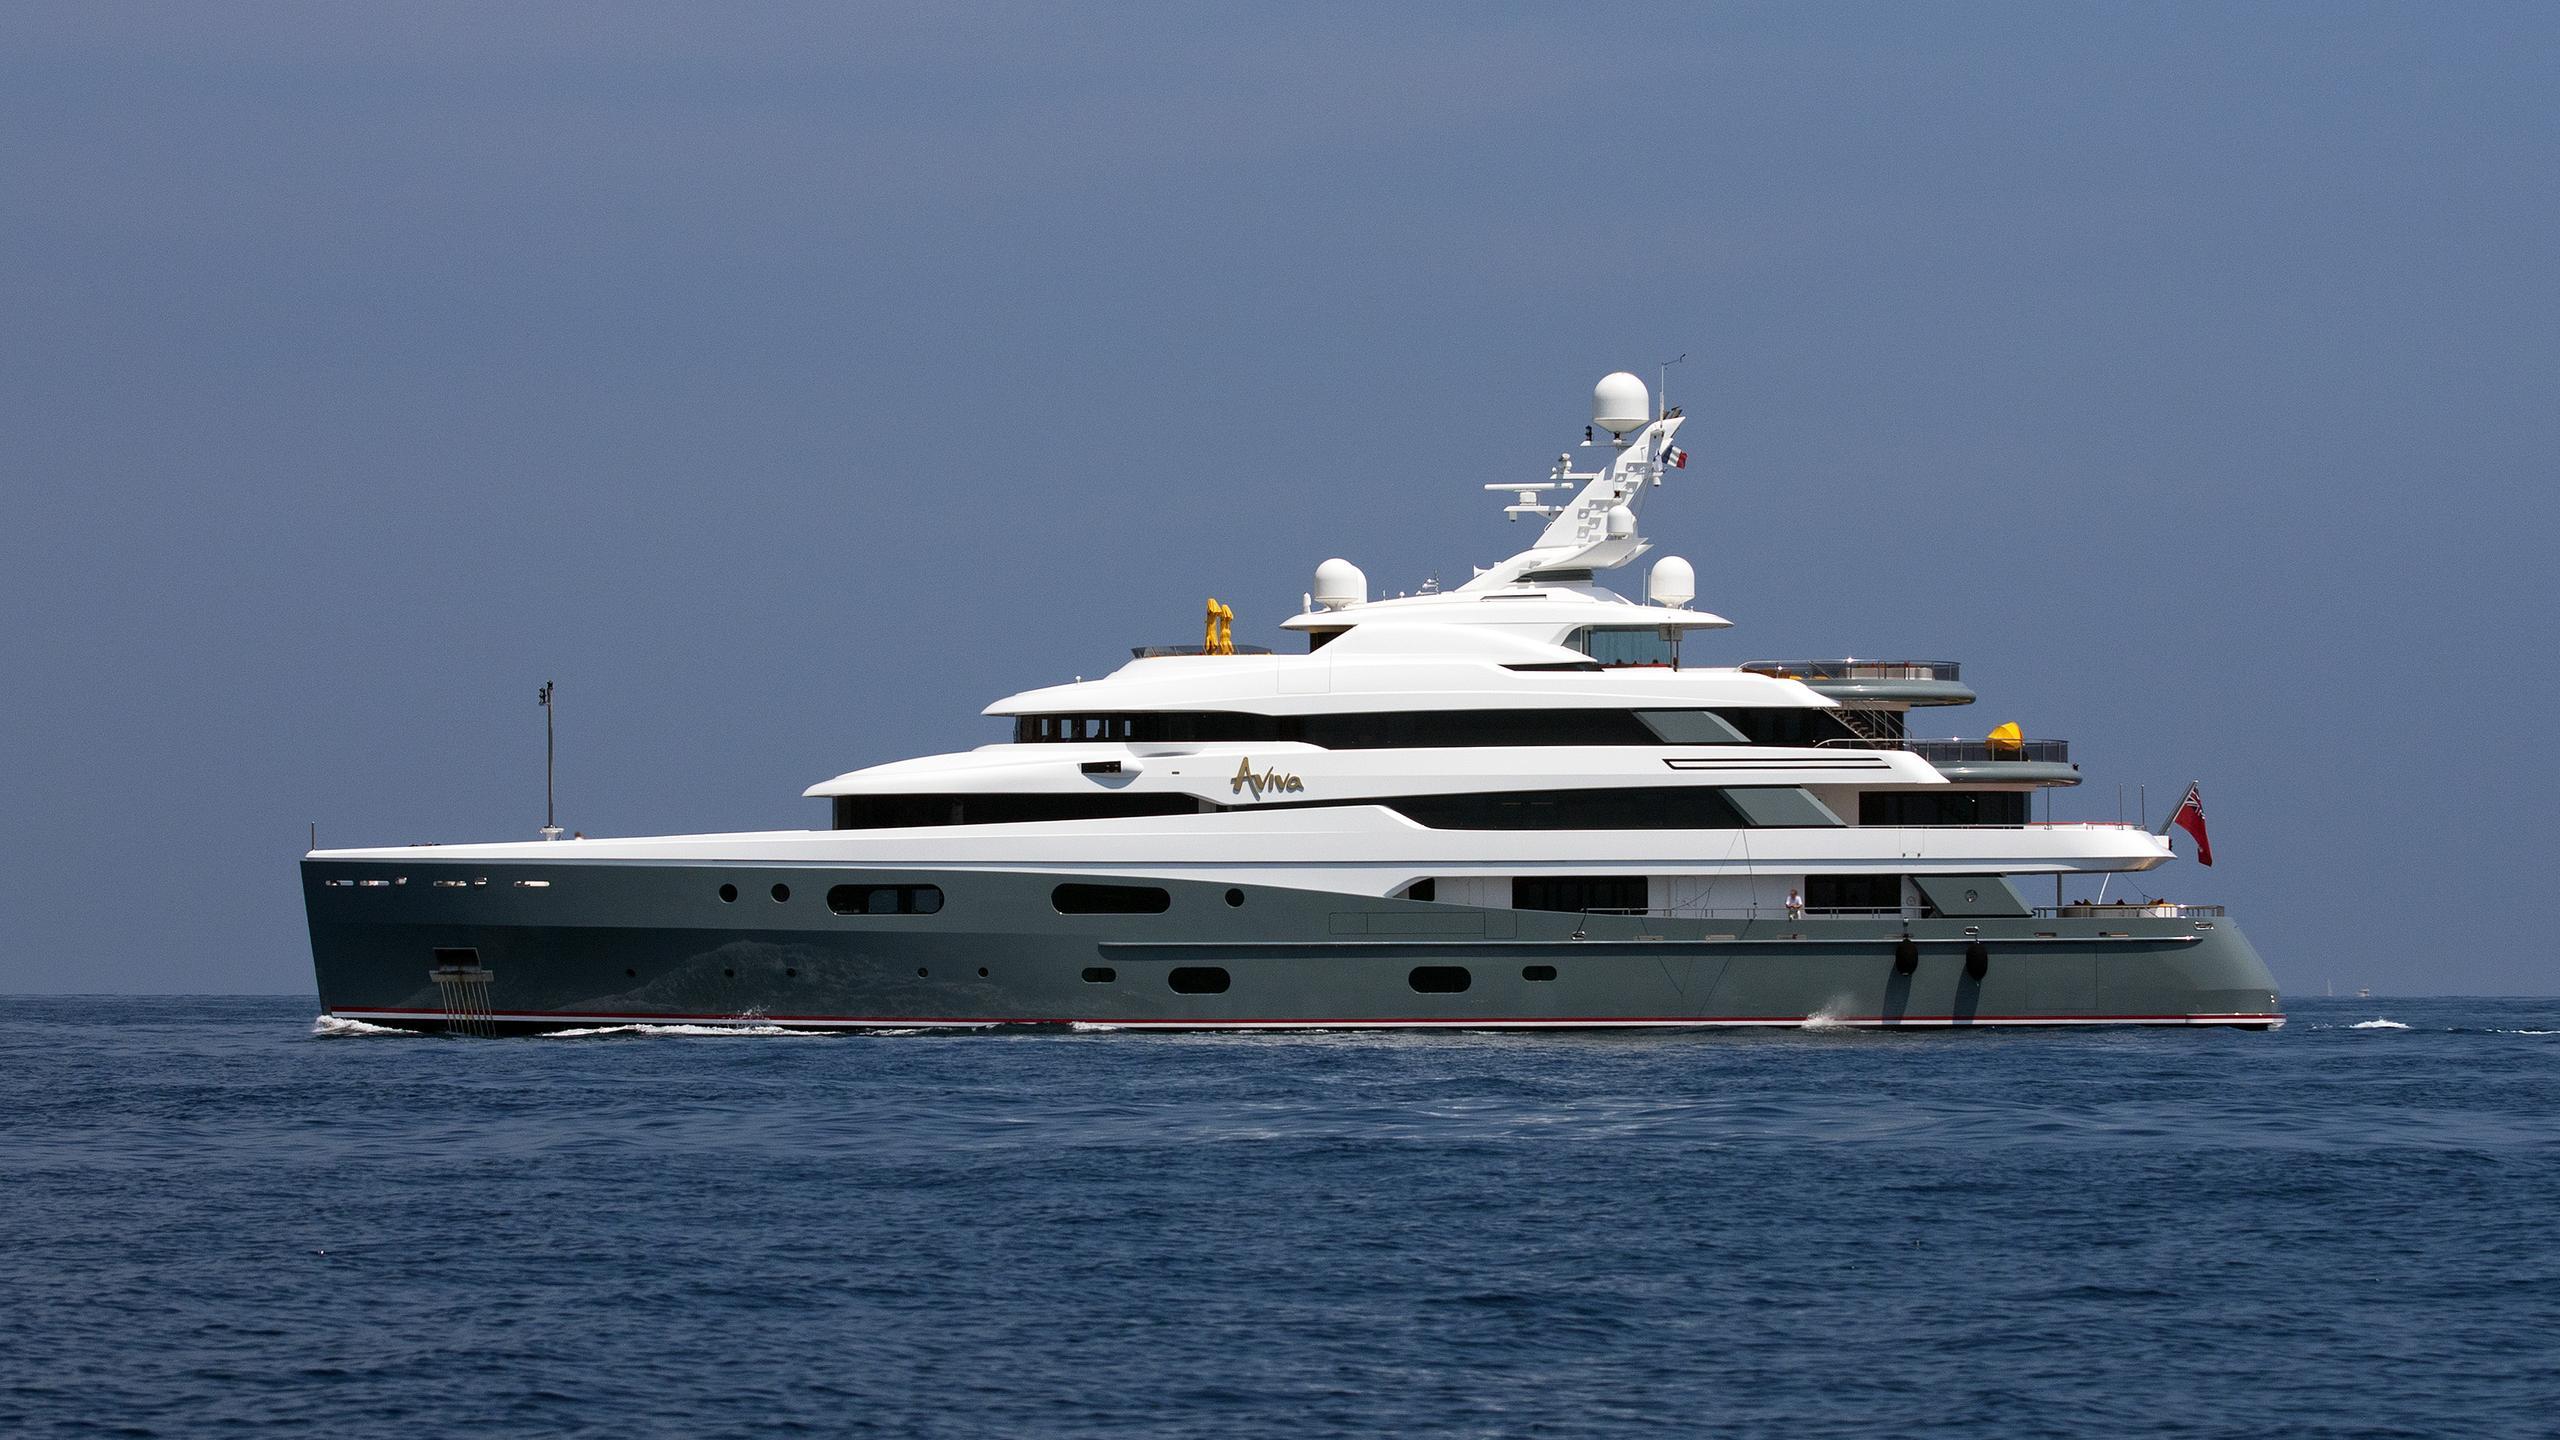 aviva-motor-yacht-abeking-rasmussen-2007-68m-profile